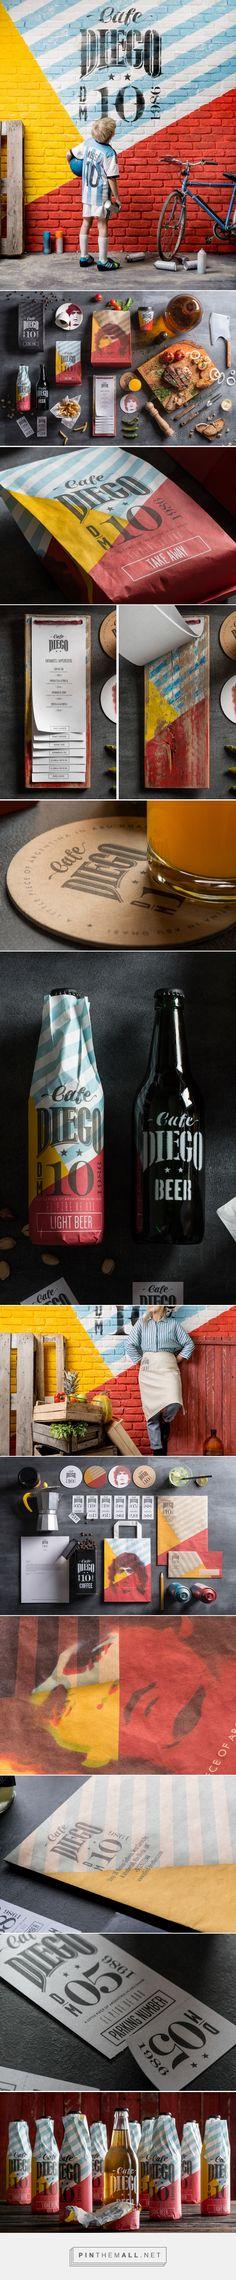 Cafe Diego Branding on Behance Web Design Agency, Brand Identity Design, Corporate Design, Retail Design, Branding Design, Corporate Identity, Graphic Design Tutorials, Graphic Design Inspiration, Brand Packaging